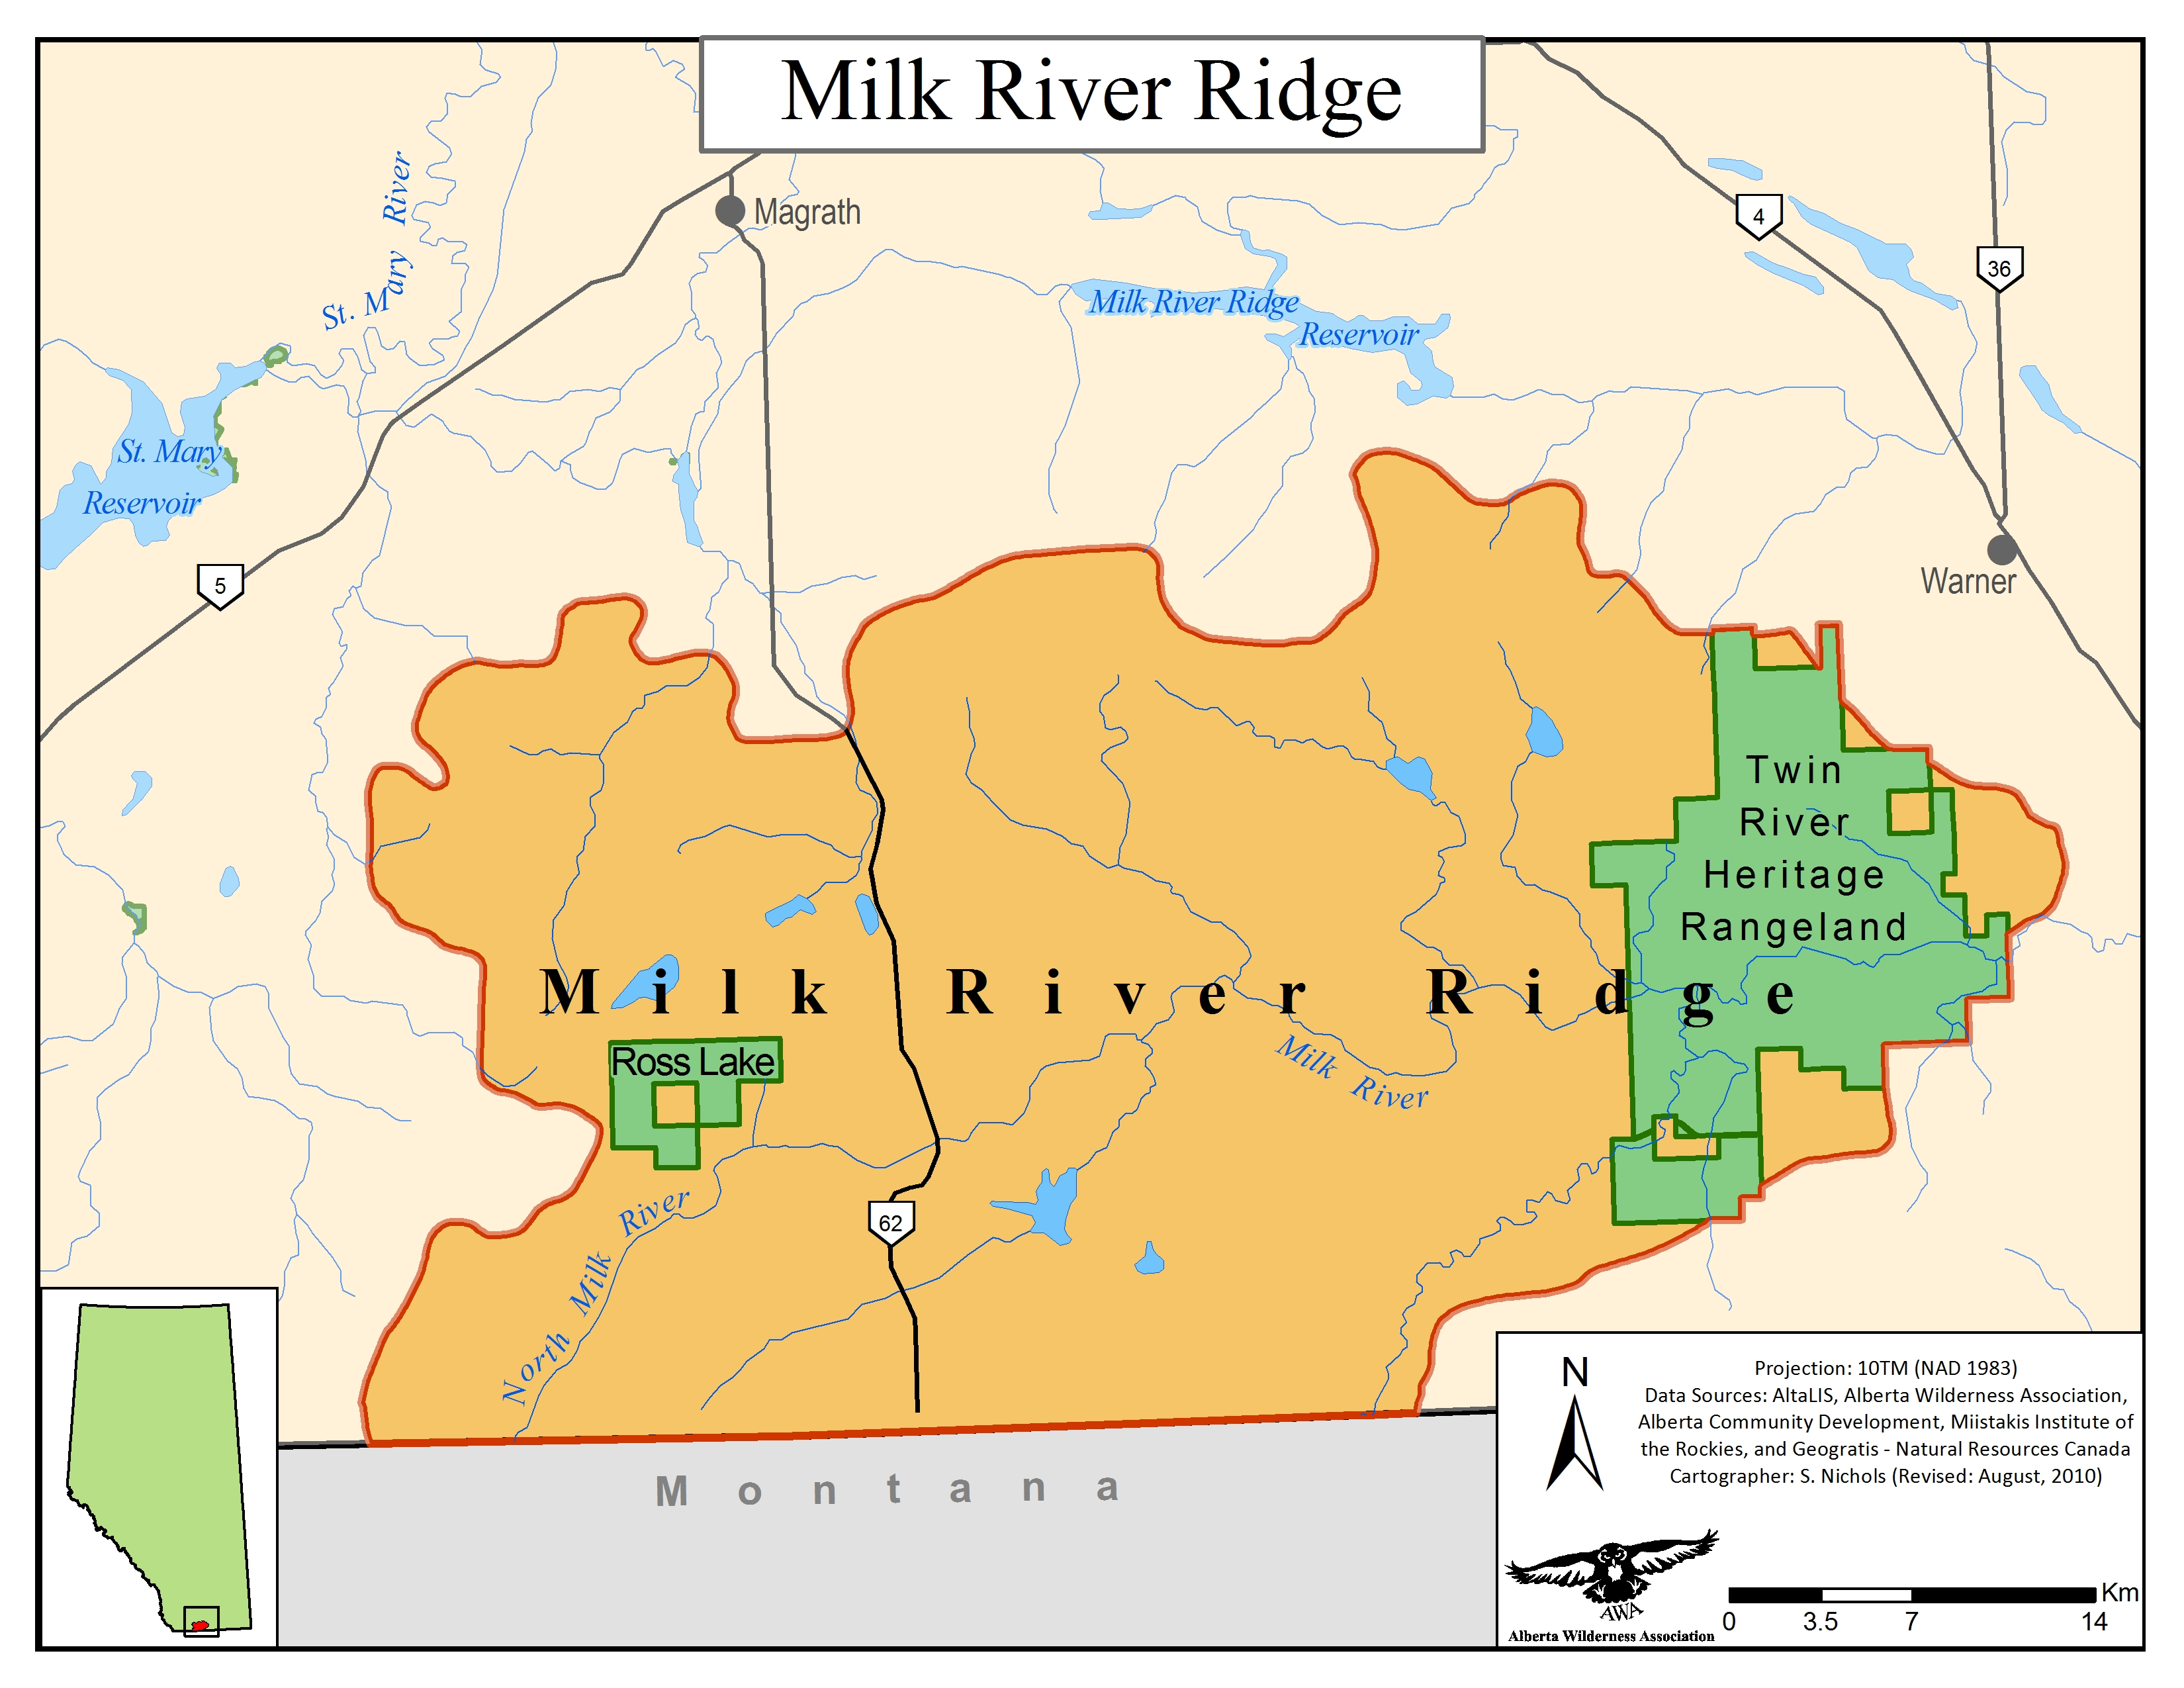 Milk River Ridge Alberta Wilderness Association